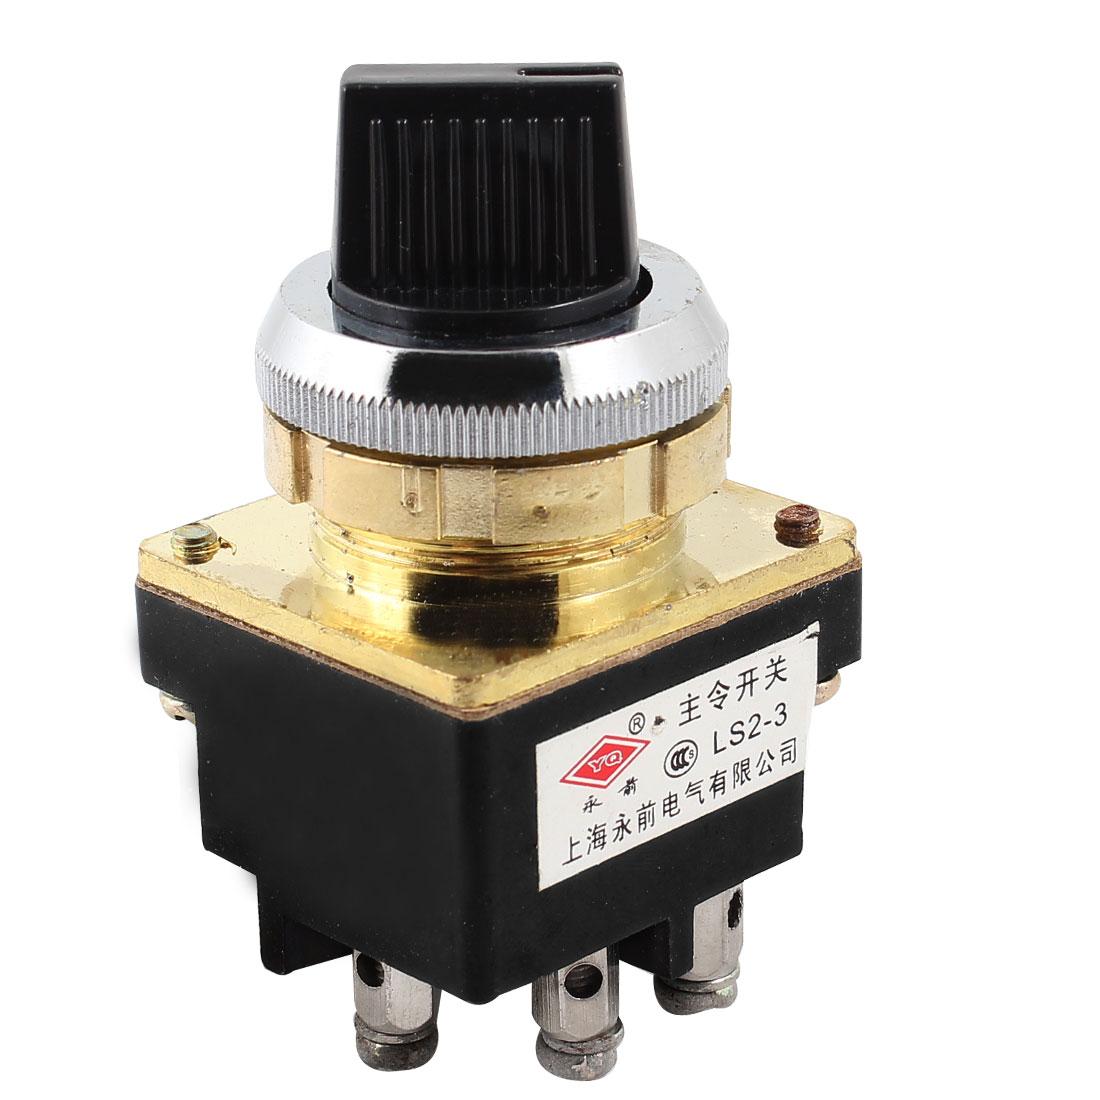 LS2 Series DPST 1NO+1NC 3P Latching Rotary Control Switch 380V 6A 220V 8A 127V 10A